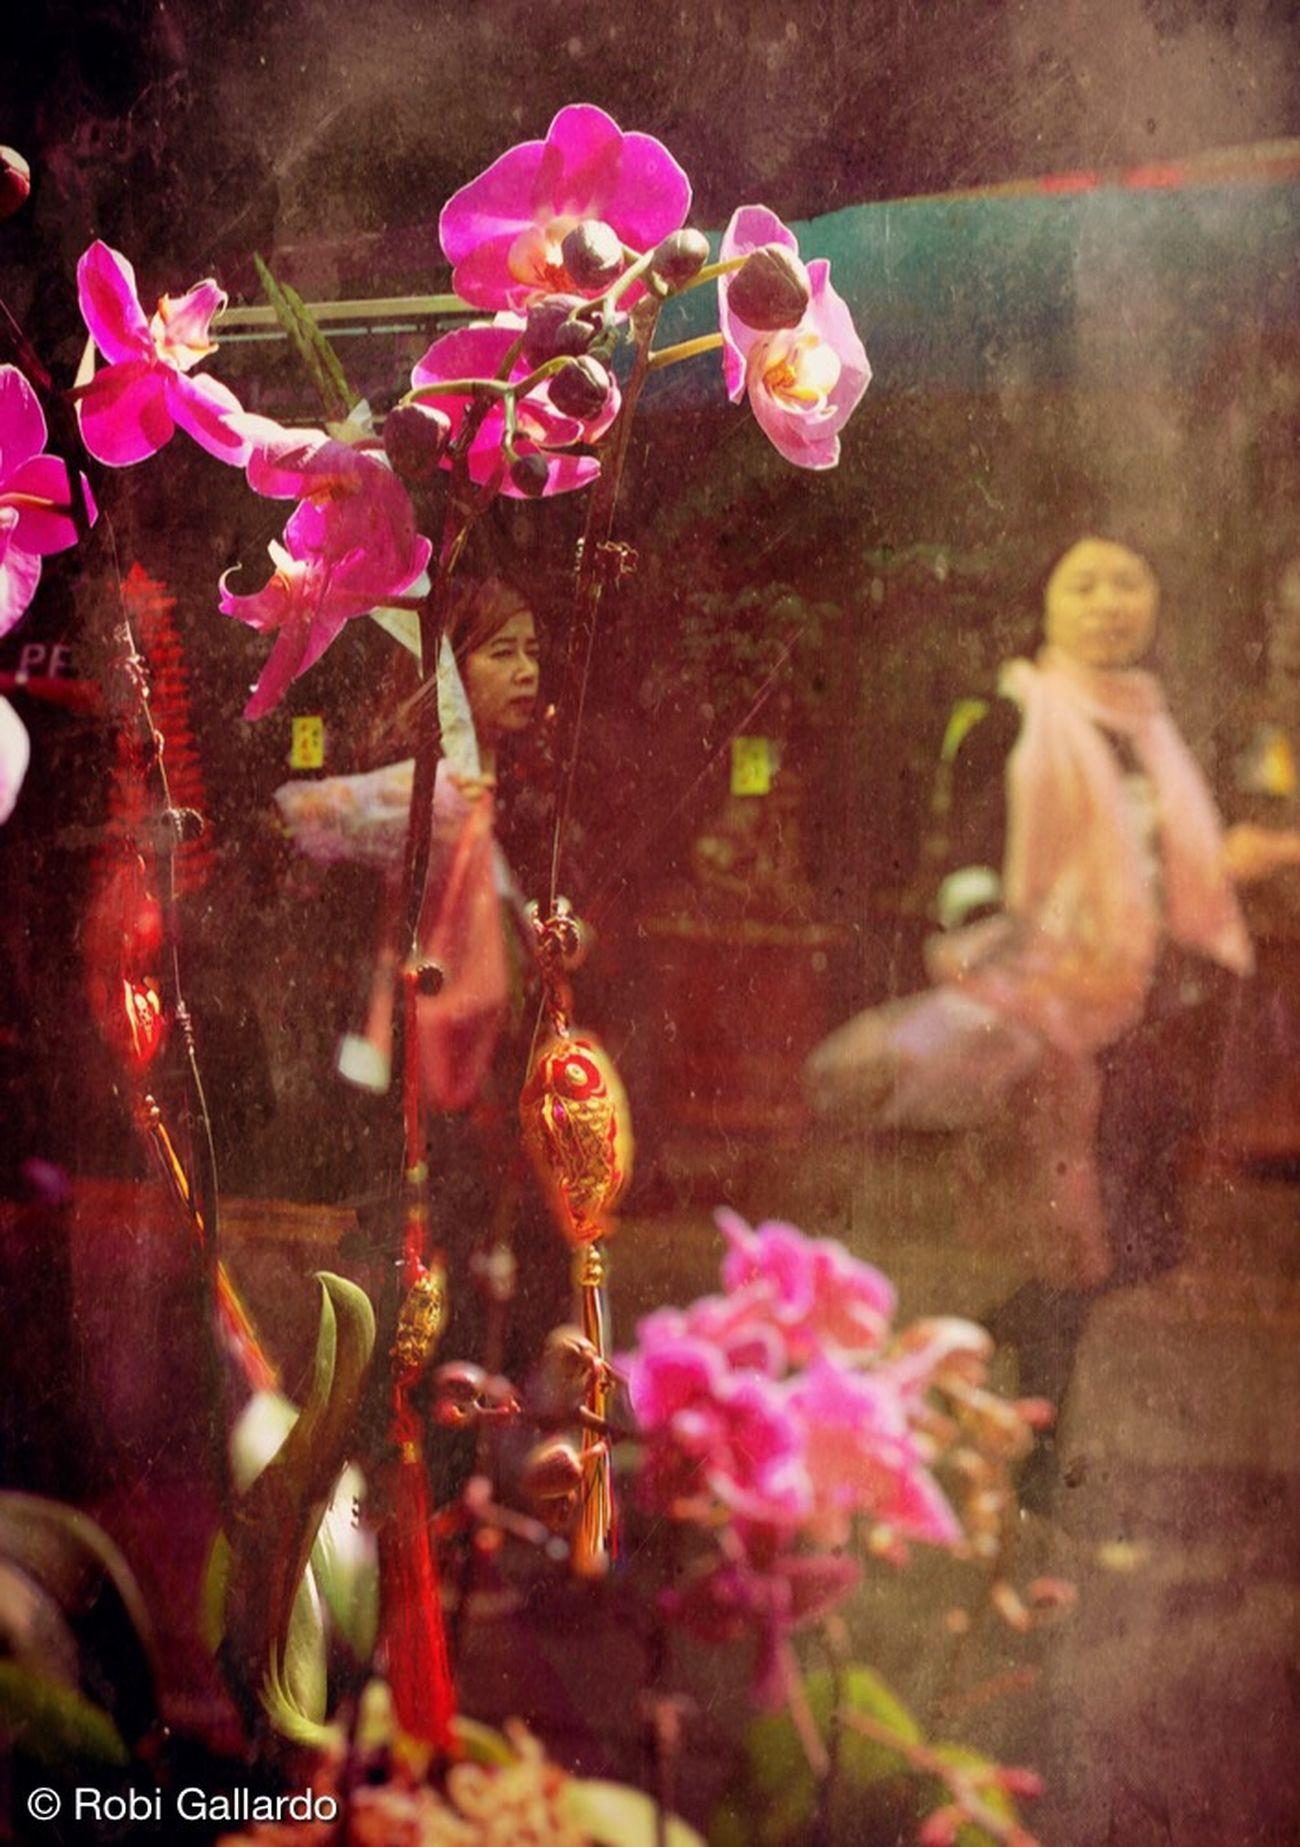 Chinese New Year flowers. Eyem Philippines Shootermag Streetphotography IPhoneography WeAreJuxt.com Theappwhisperer Iphone6plus Hong Kong NEM Submissions NEM Street NEM GoodKarma AMPt_community Chinese New Year